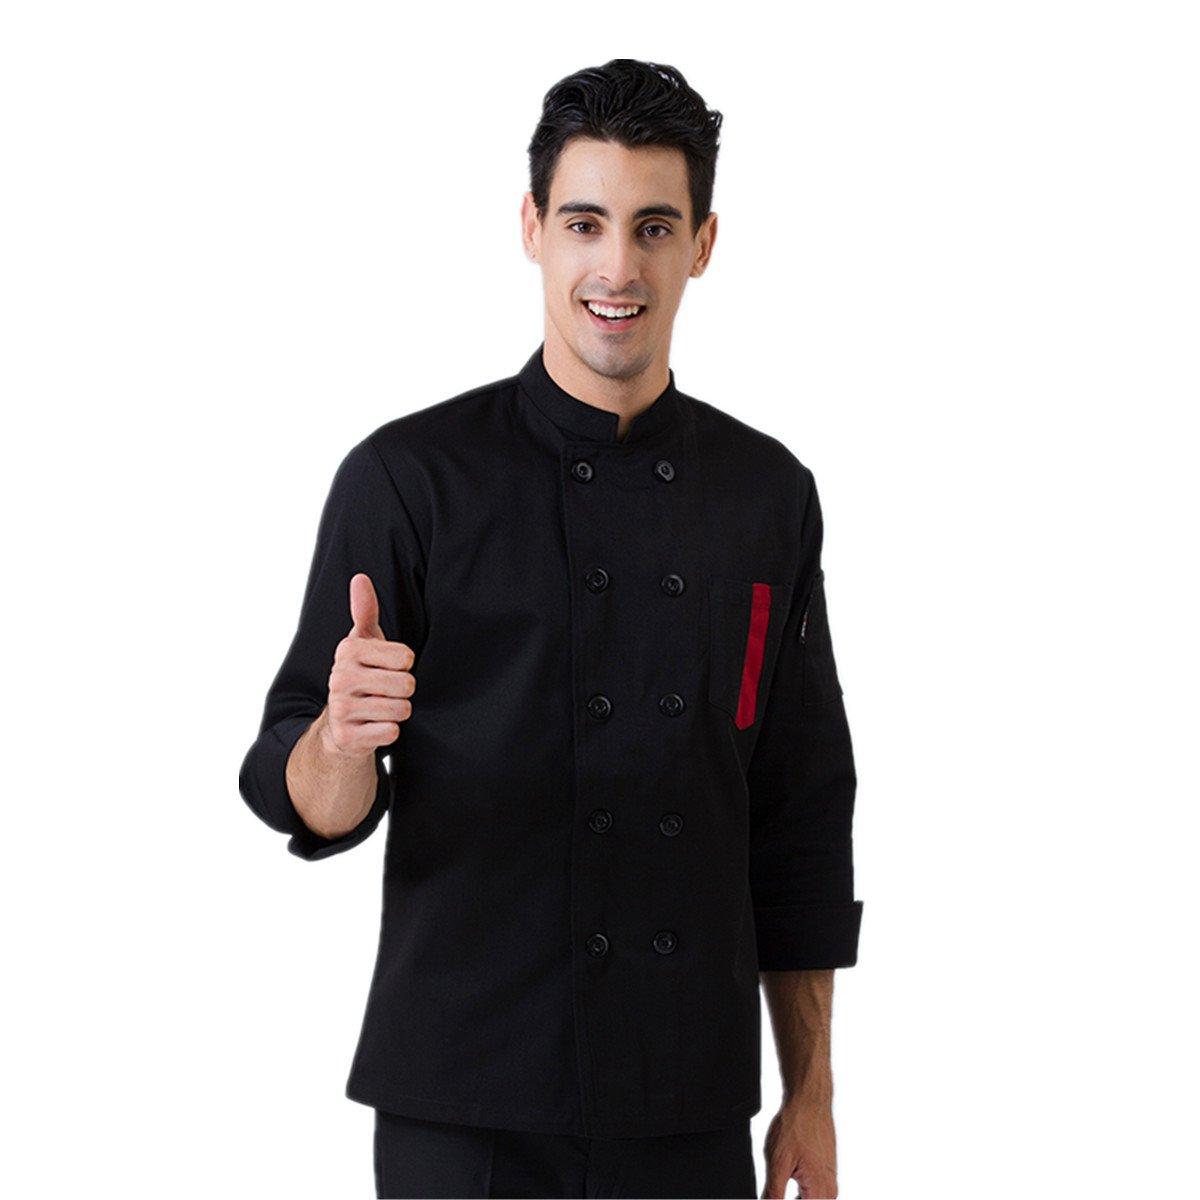 XINFU Chef's Uniform Short/Long Sleeve Decoration Hotel Western Restaurant Kitchen Single Button Chef Jacket